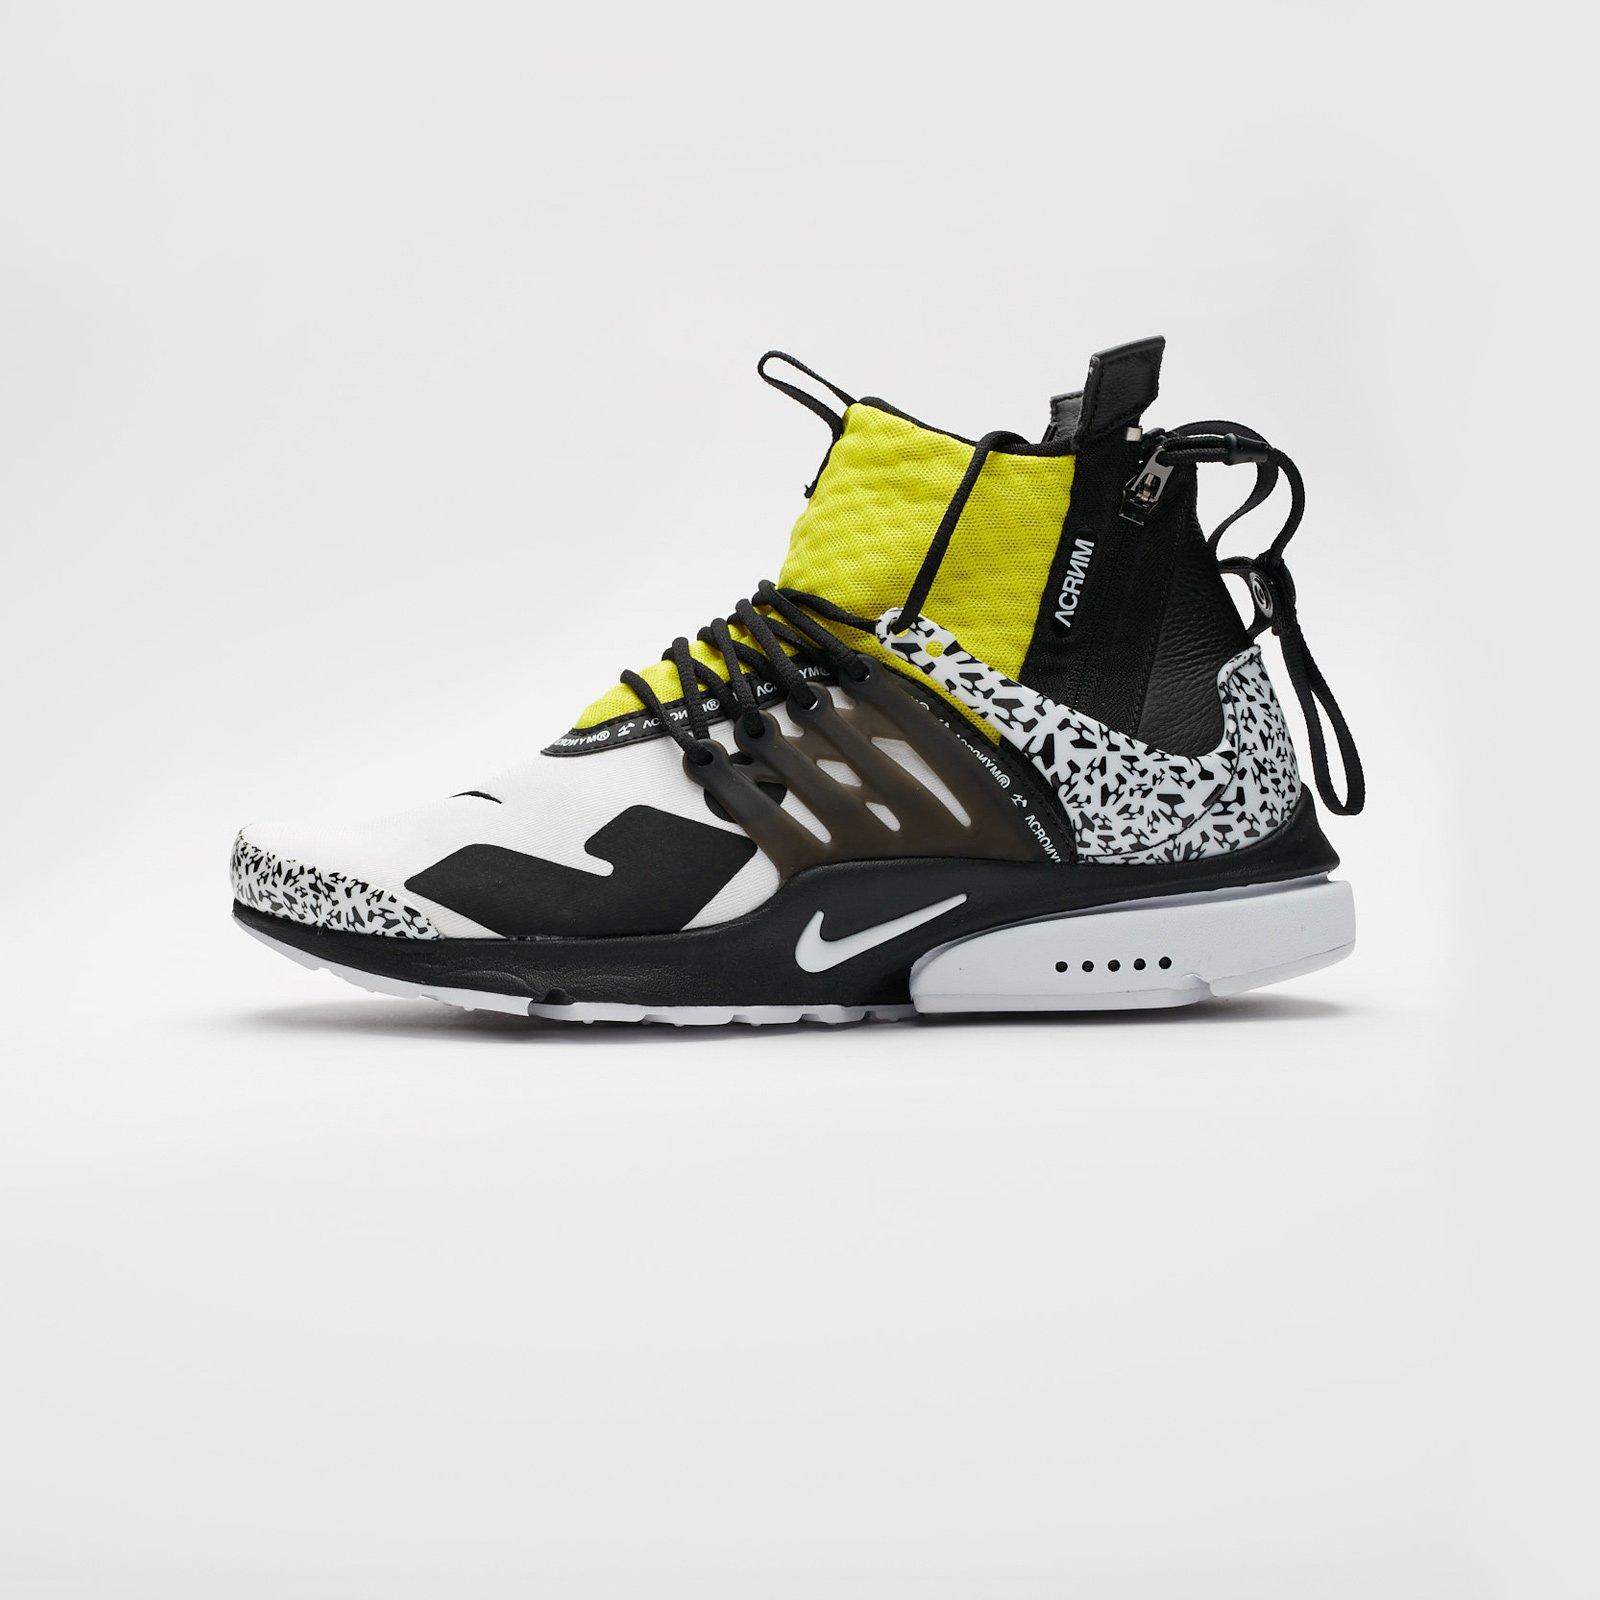 biggest discount best service on sale Nike Air Presto Mid x Acronym - Ah7832-100 - Sneakersnstuff ...